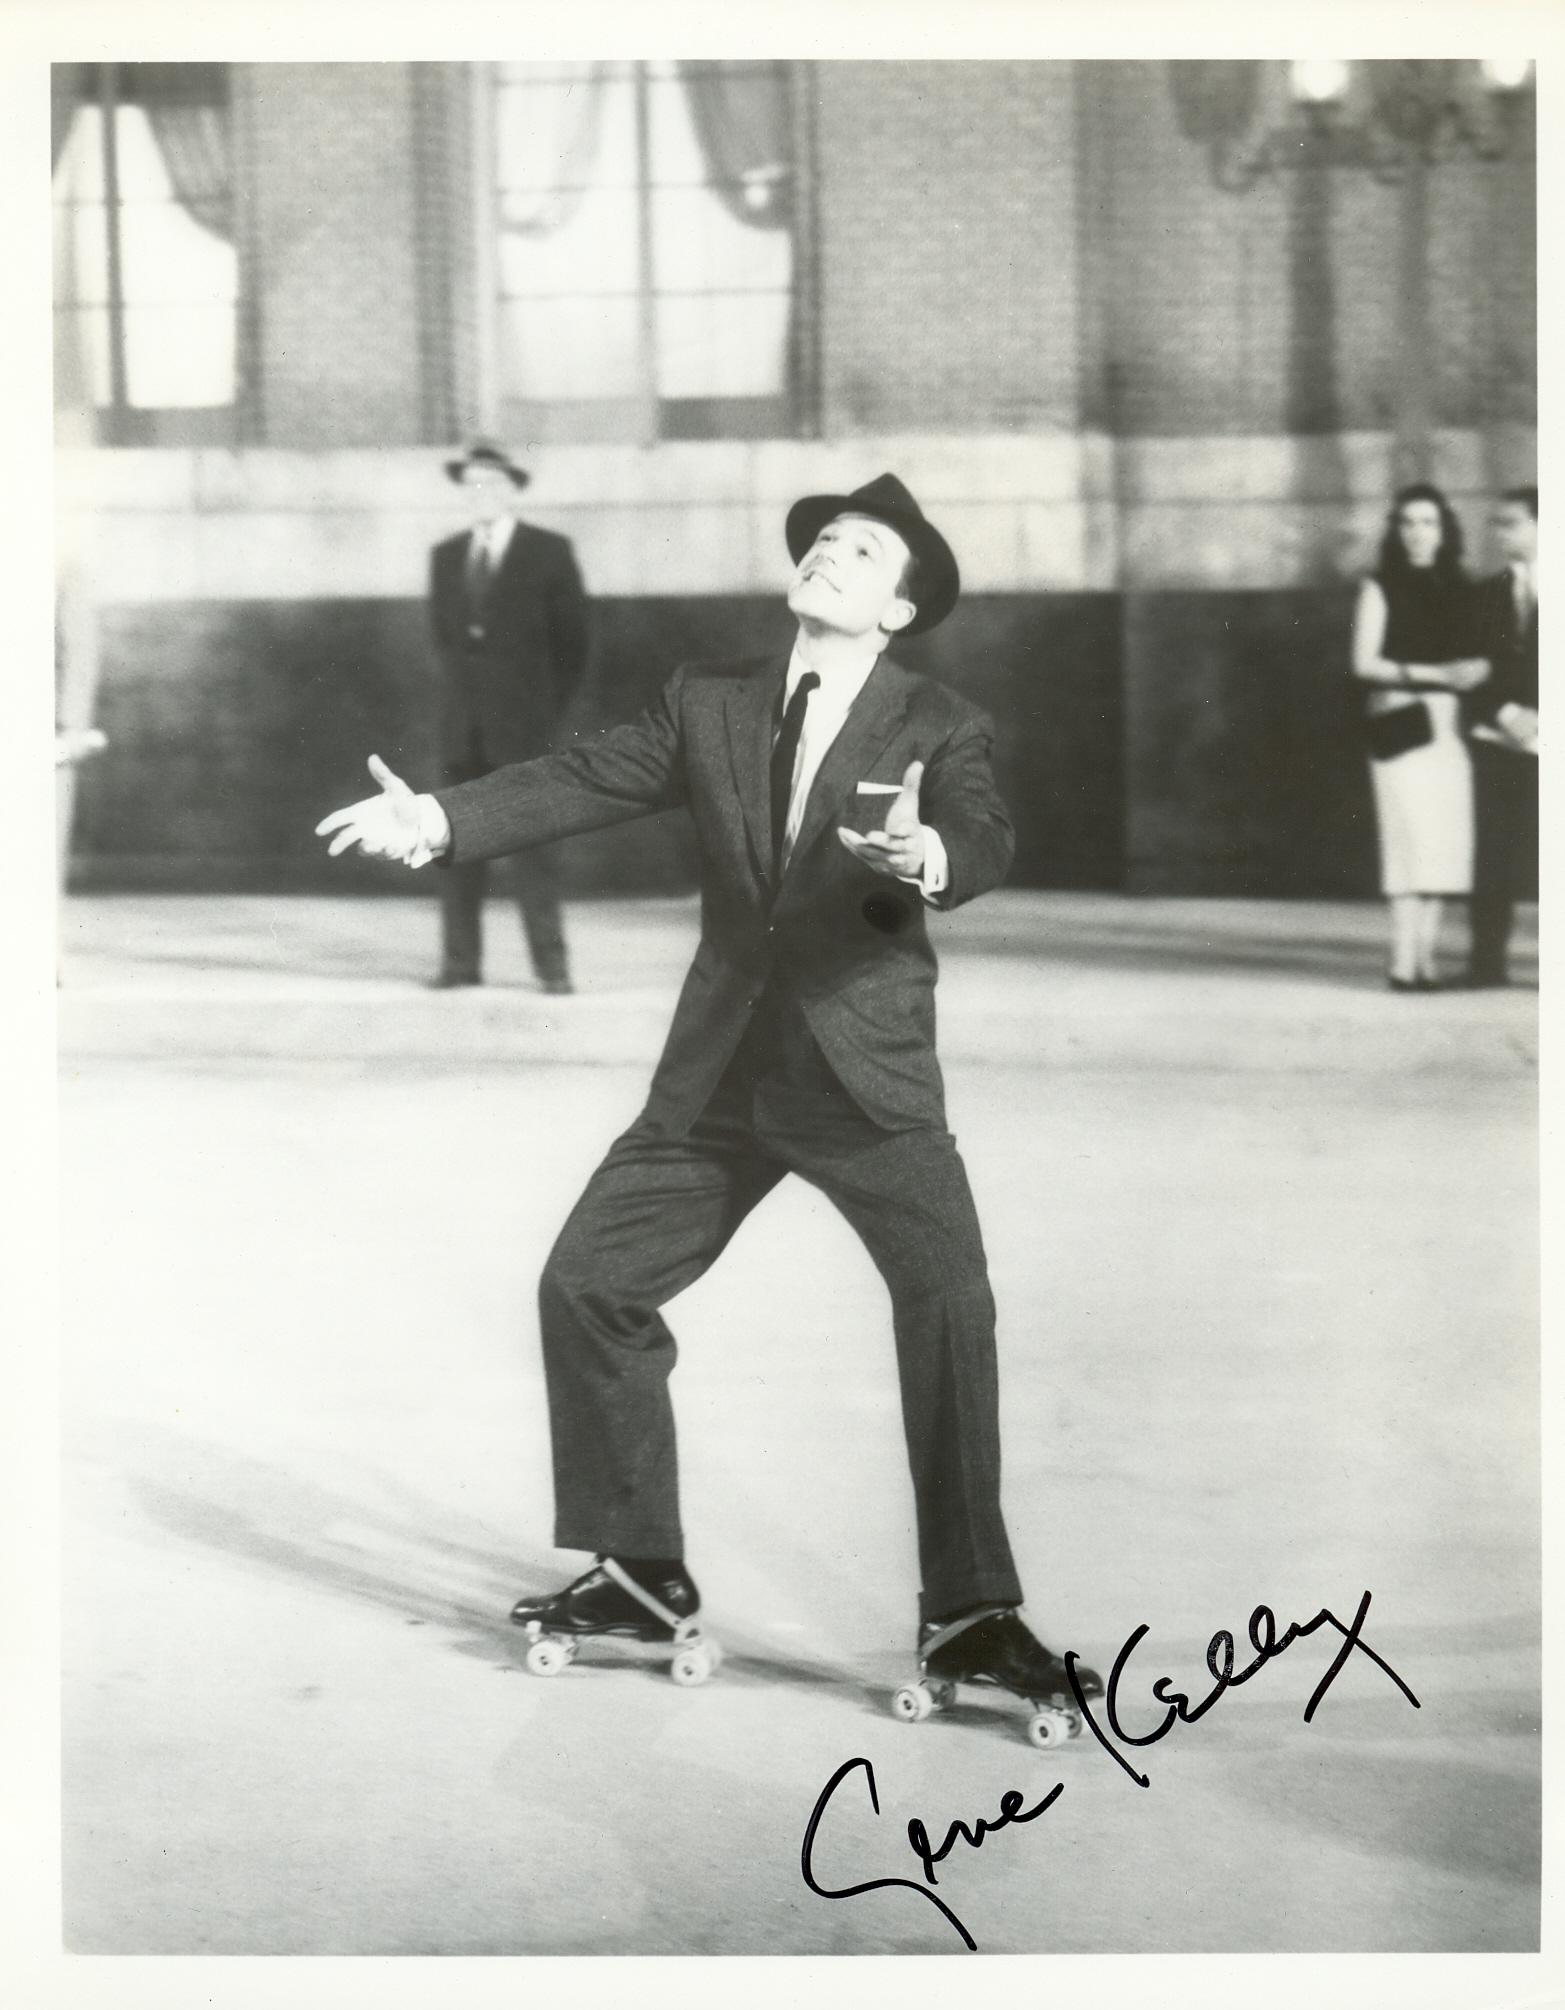 KELLY GENE: (1912-1996) American Dancer